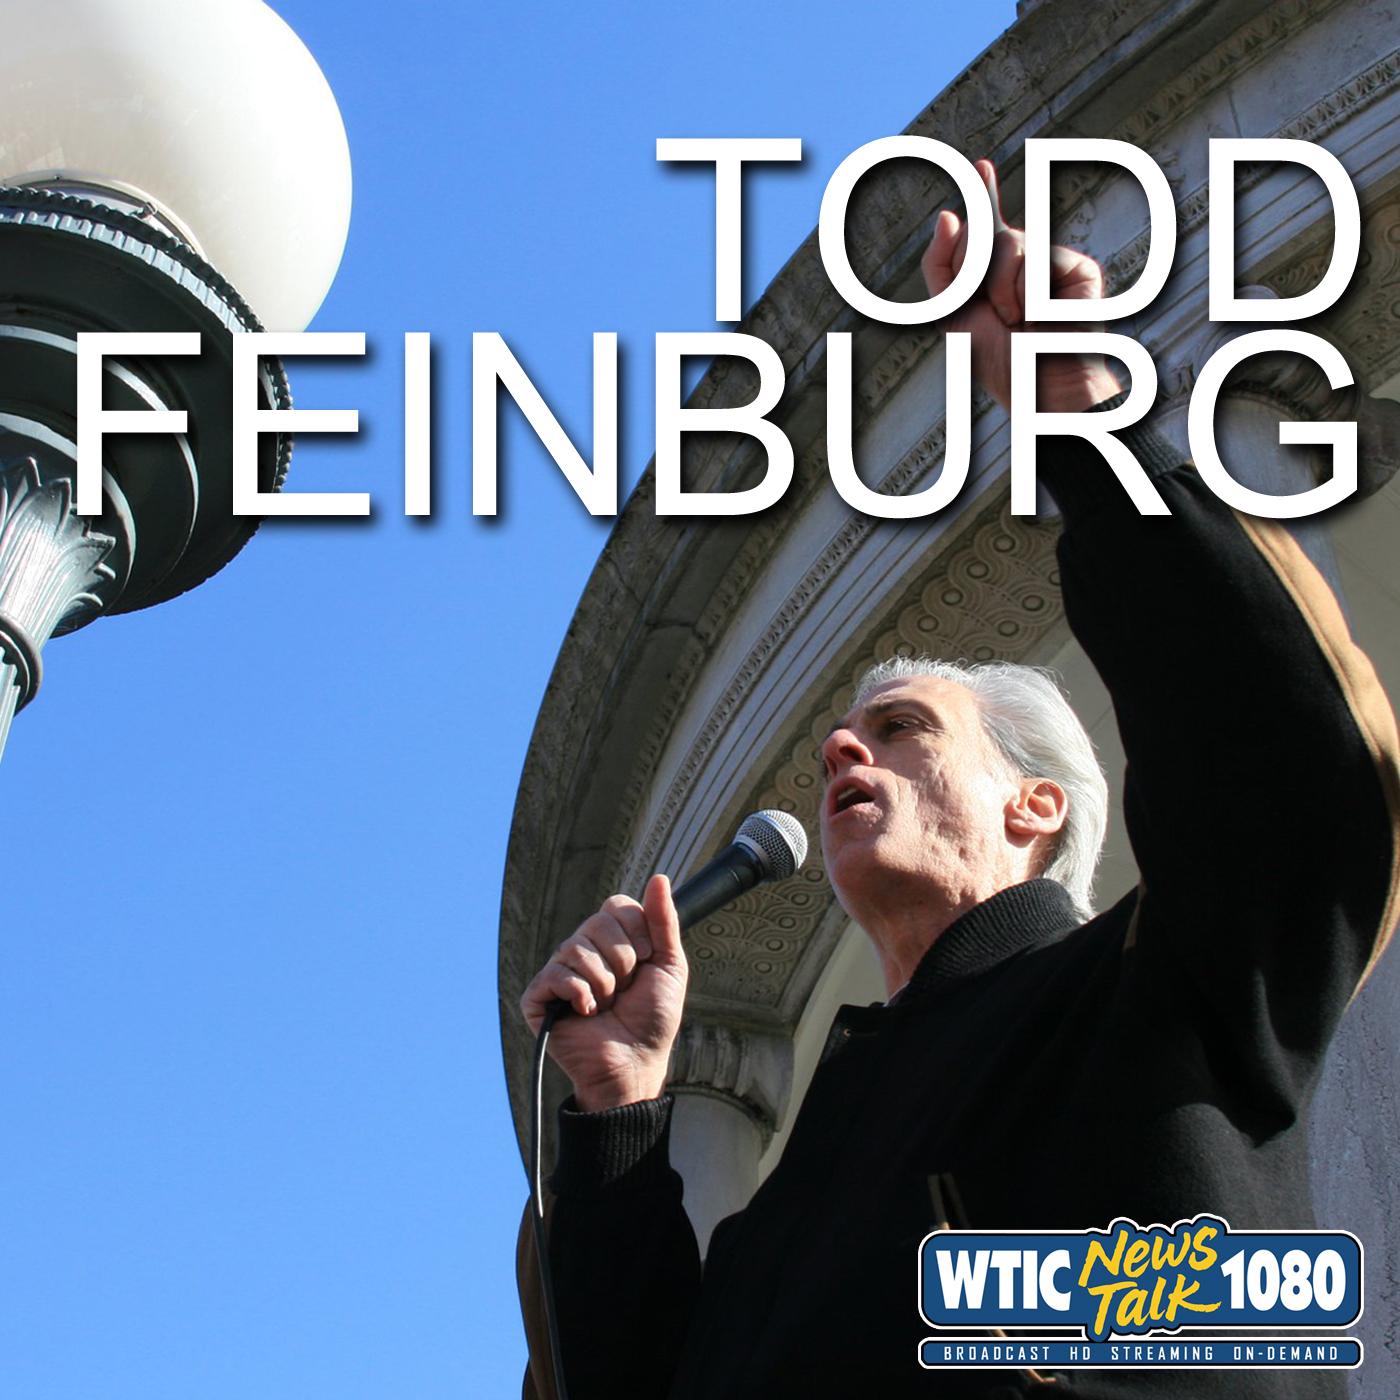 Todd Feinburg